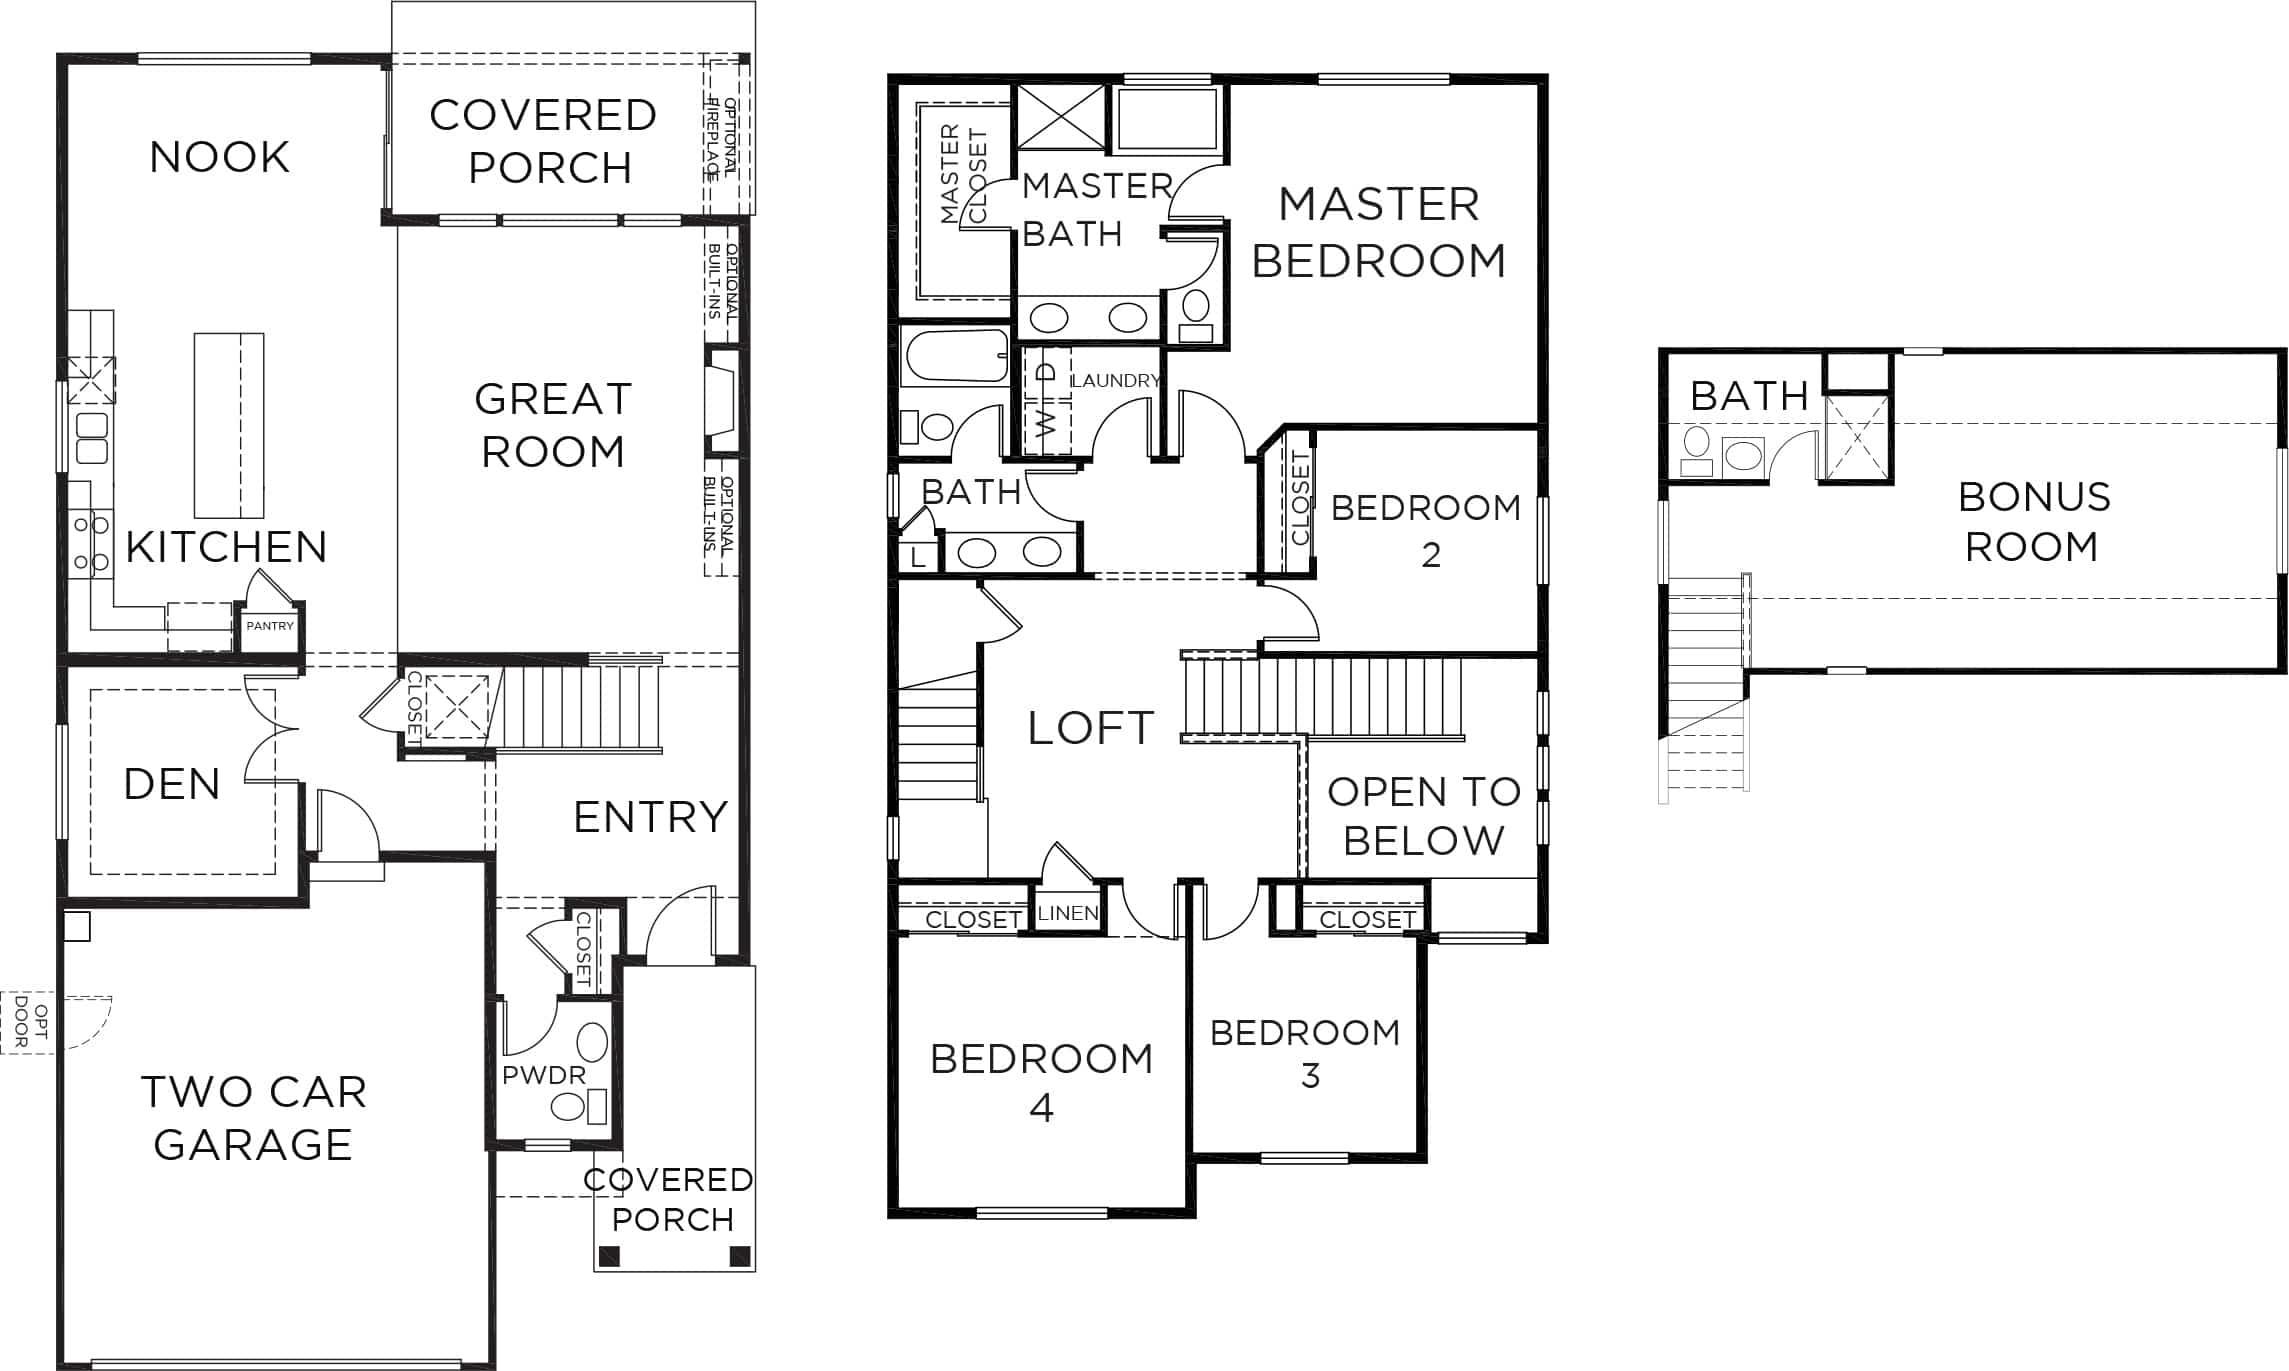 soundbuilt-willow-floorplan-2853-A2